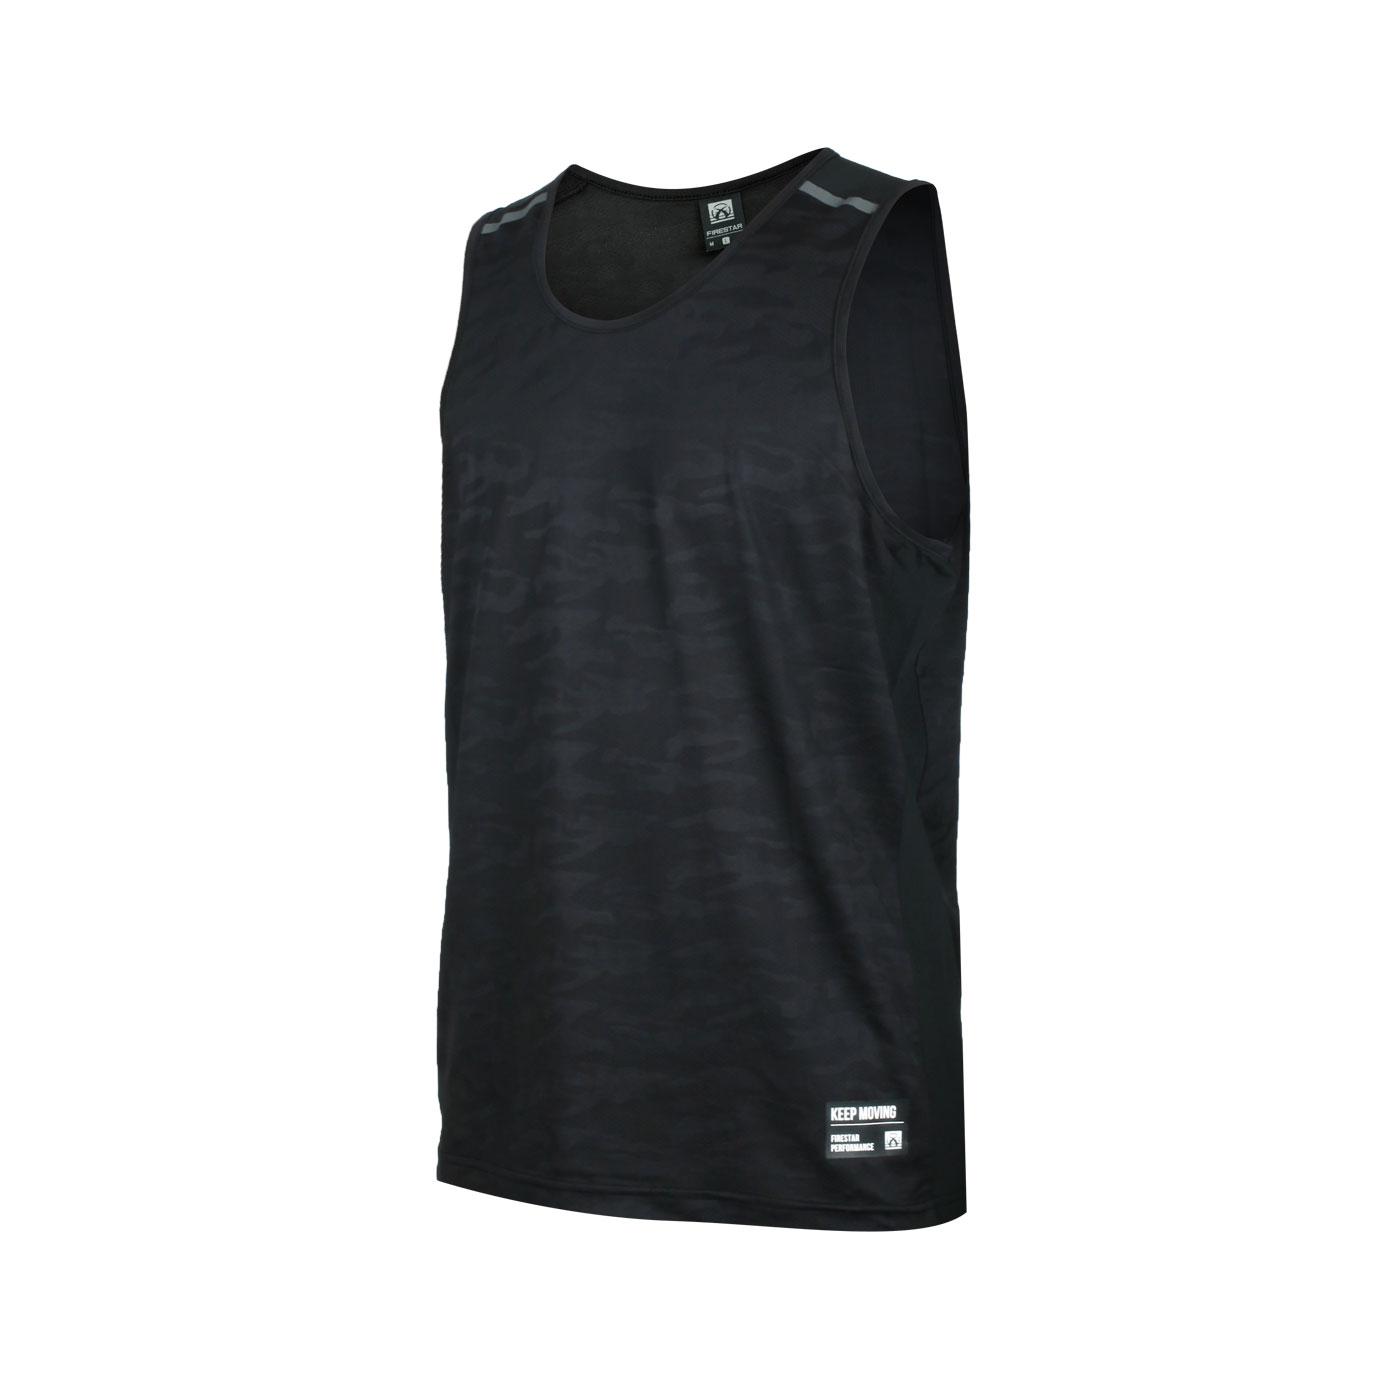 FIRESTAR 男款彈性訓練籃球背心 B0509-10 - 黑